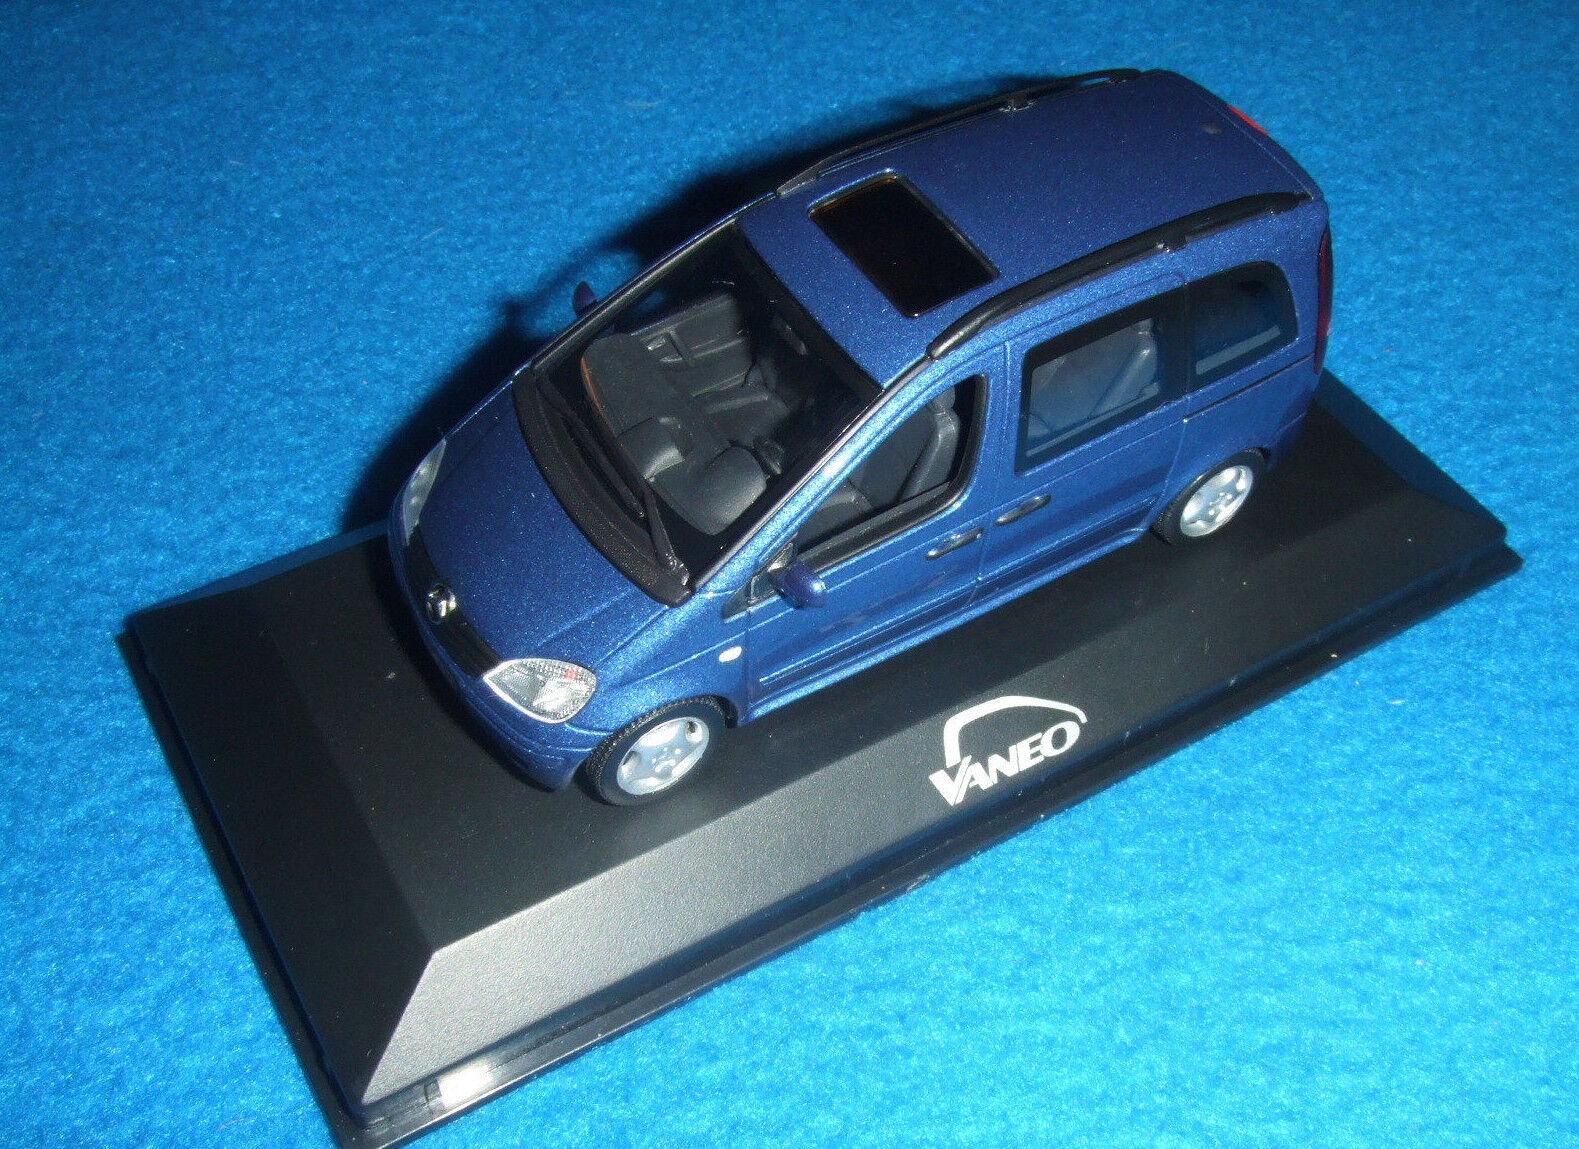 Mercedes Benz W 414 - Vaneo 2004 Jasper bluee 1 43 Nip Minichamps